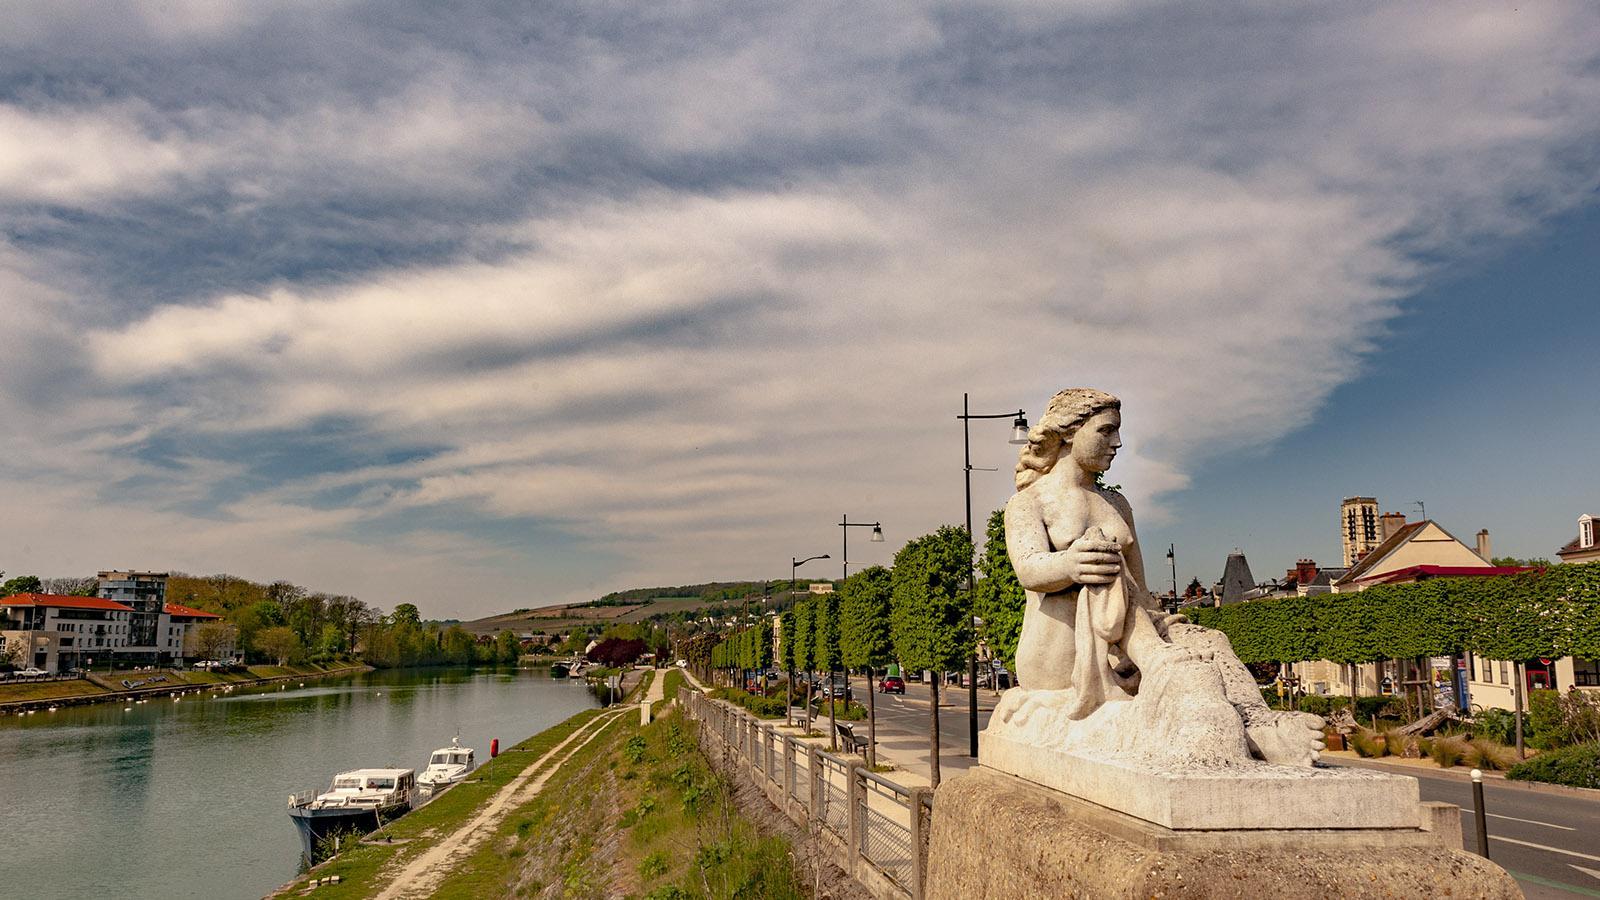 Château-Thierry: geschmückt - das Ufer der Marne. Foto: Hilke Maunder